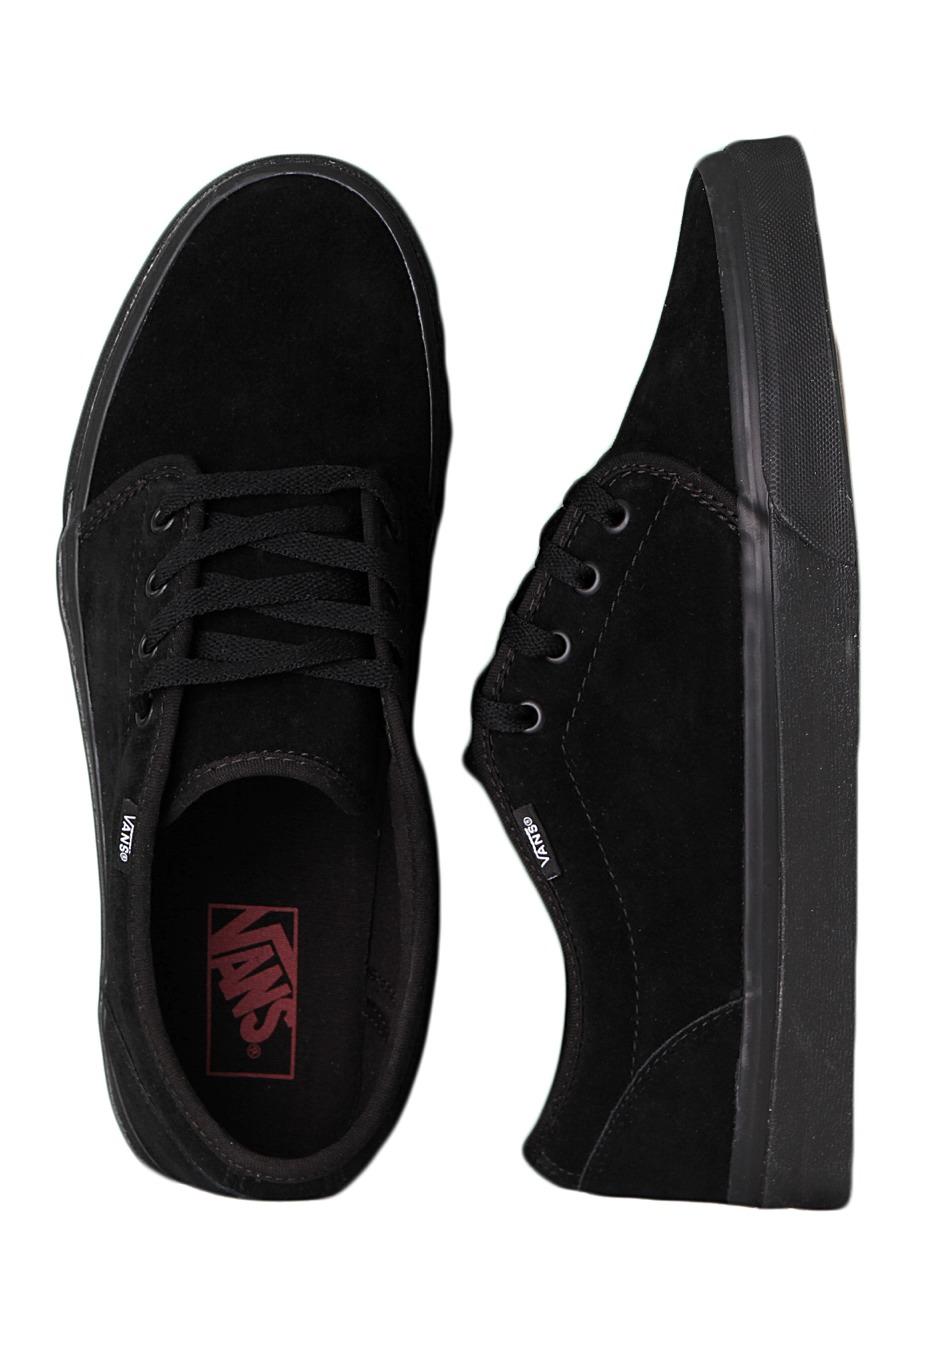 Vans - 106 Vulcanized Black Black - Shoes - Impericon.com UK aa424b196